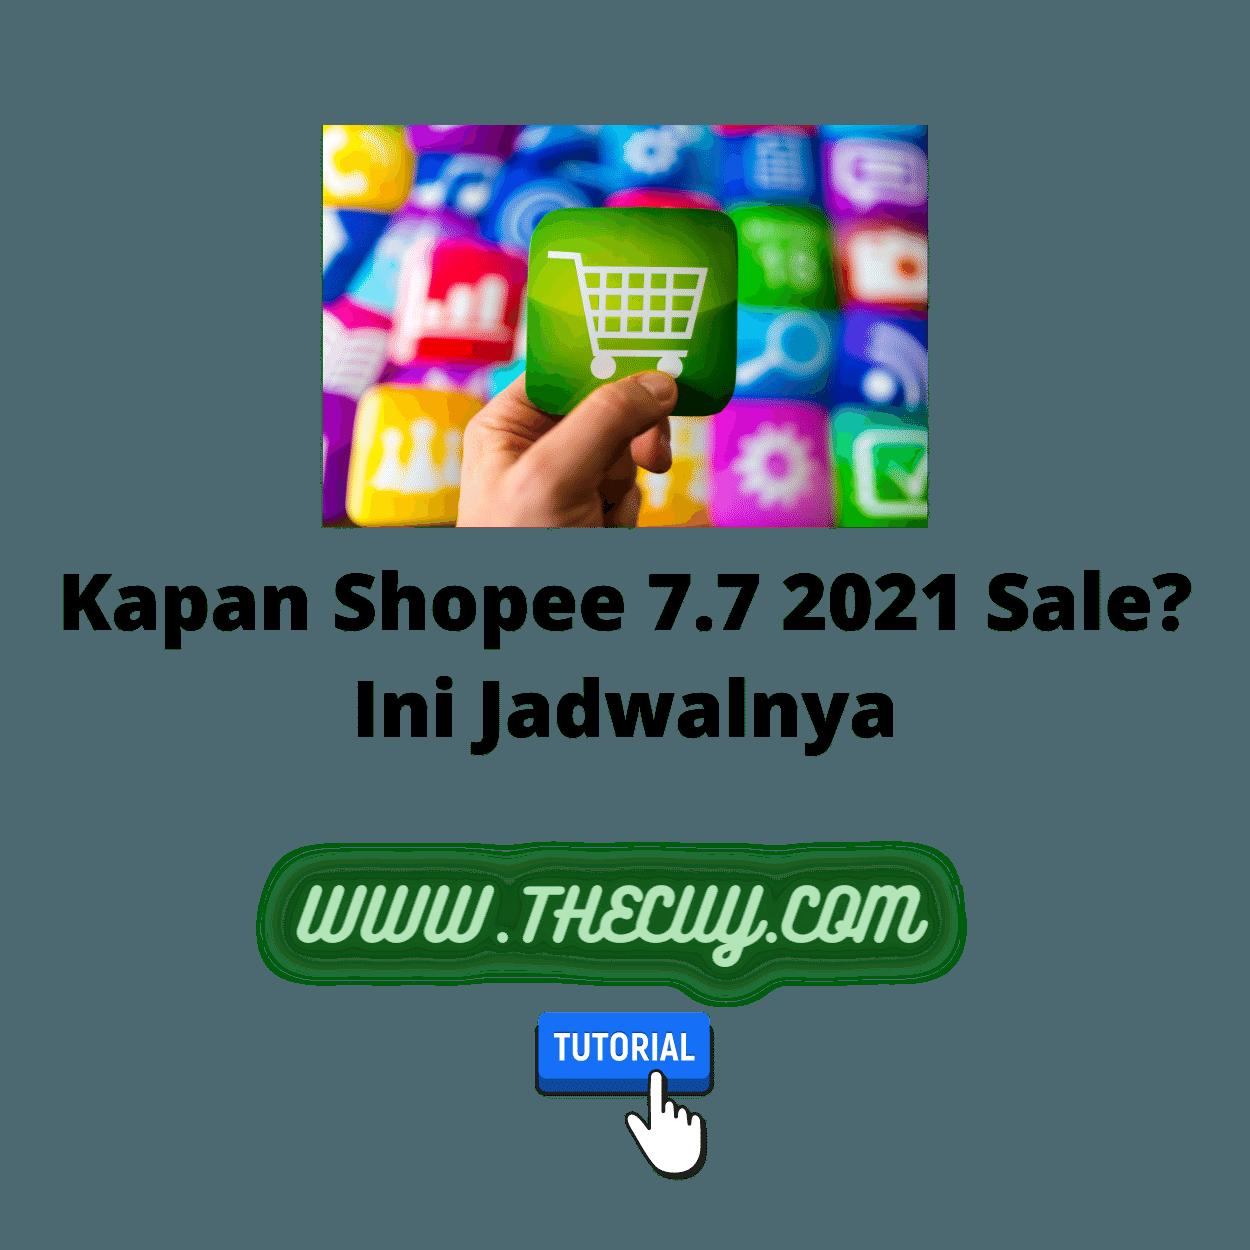 Kapan Shopee 7.7 2021 Sale? Ini Jadwalnya